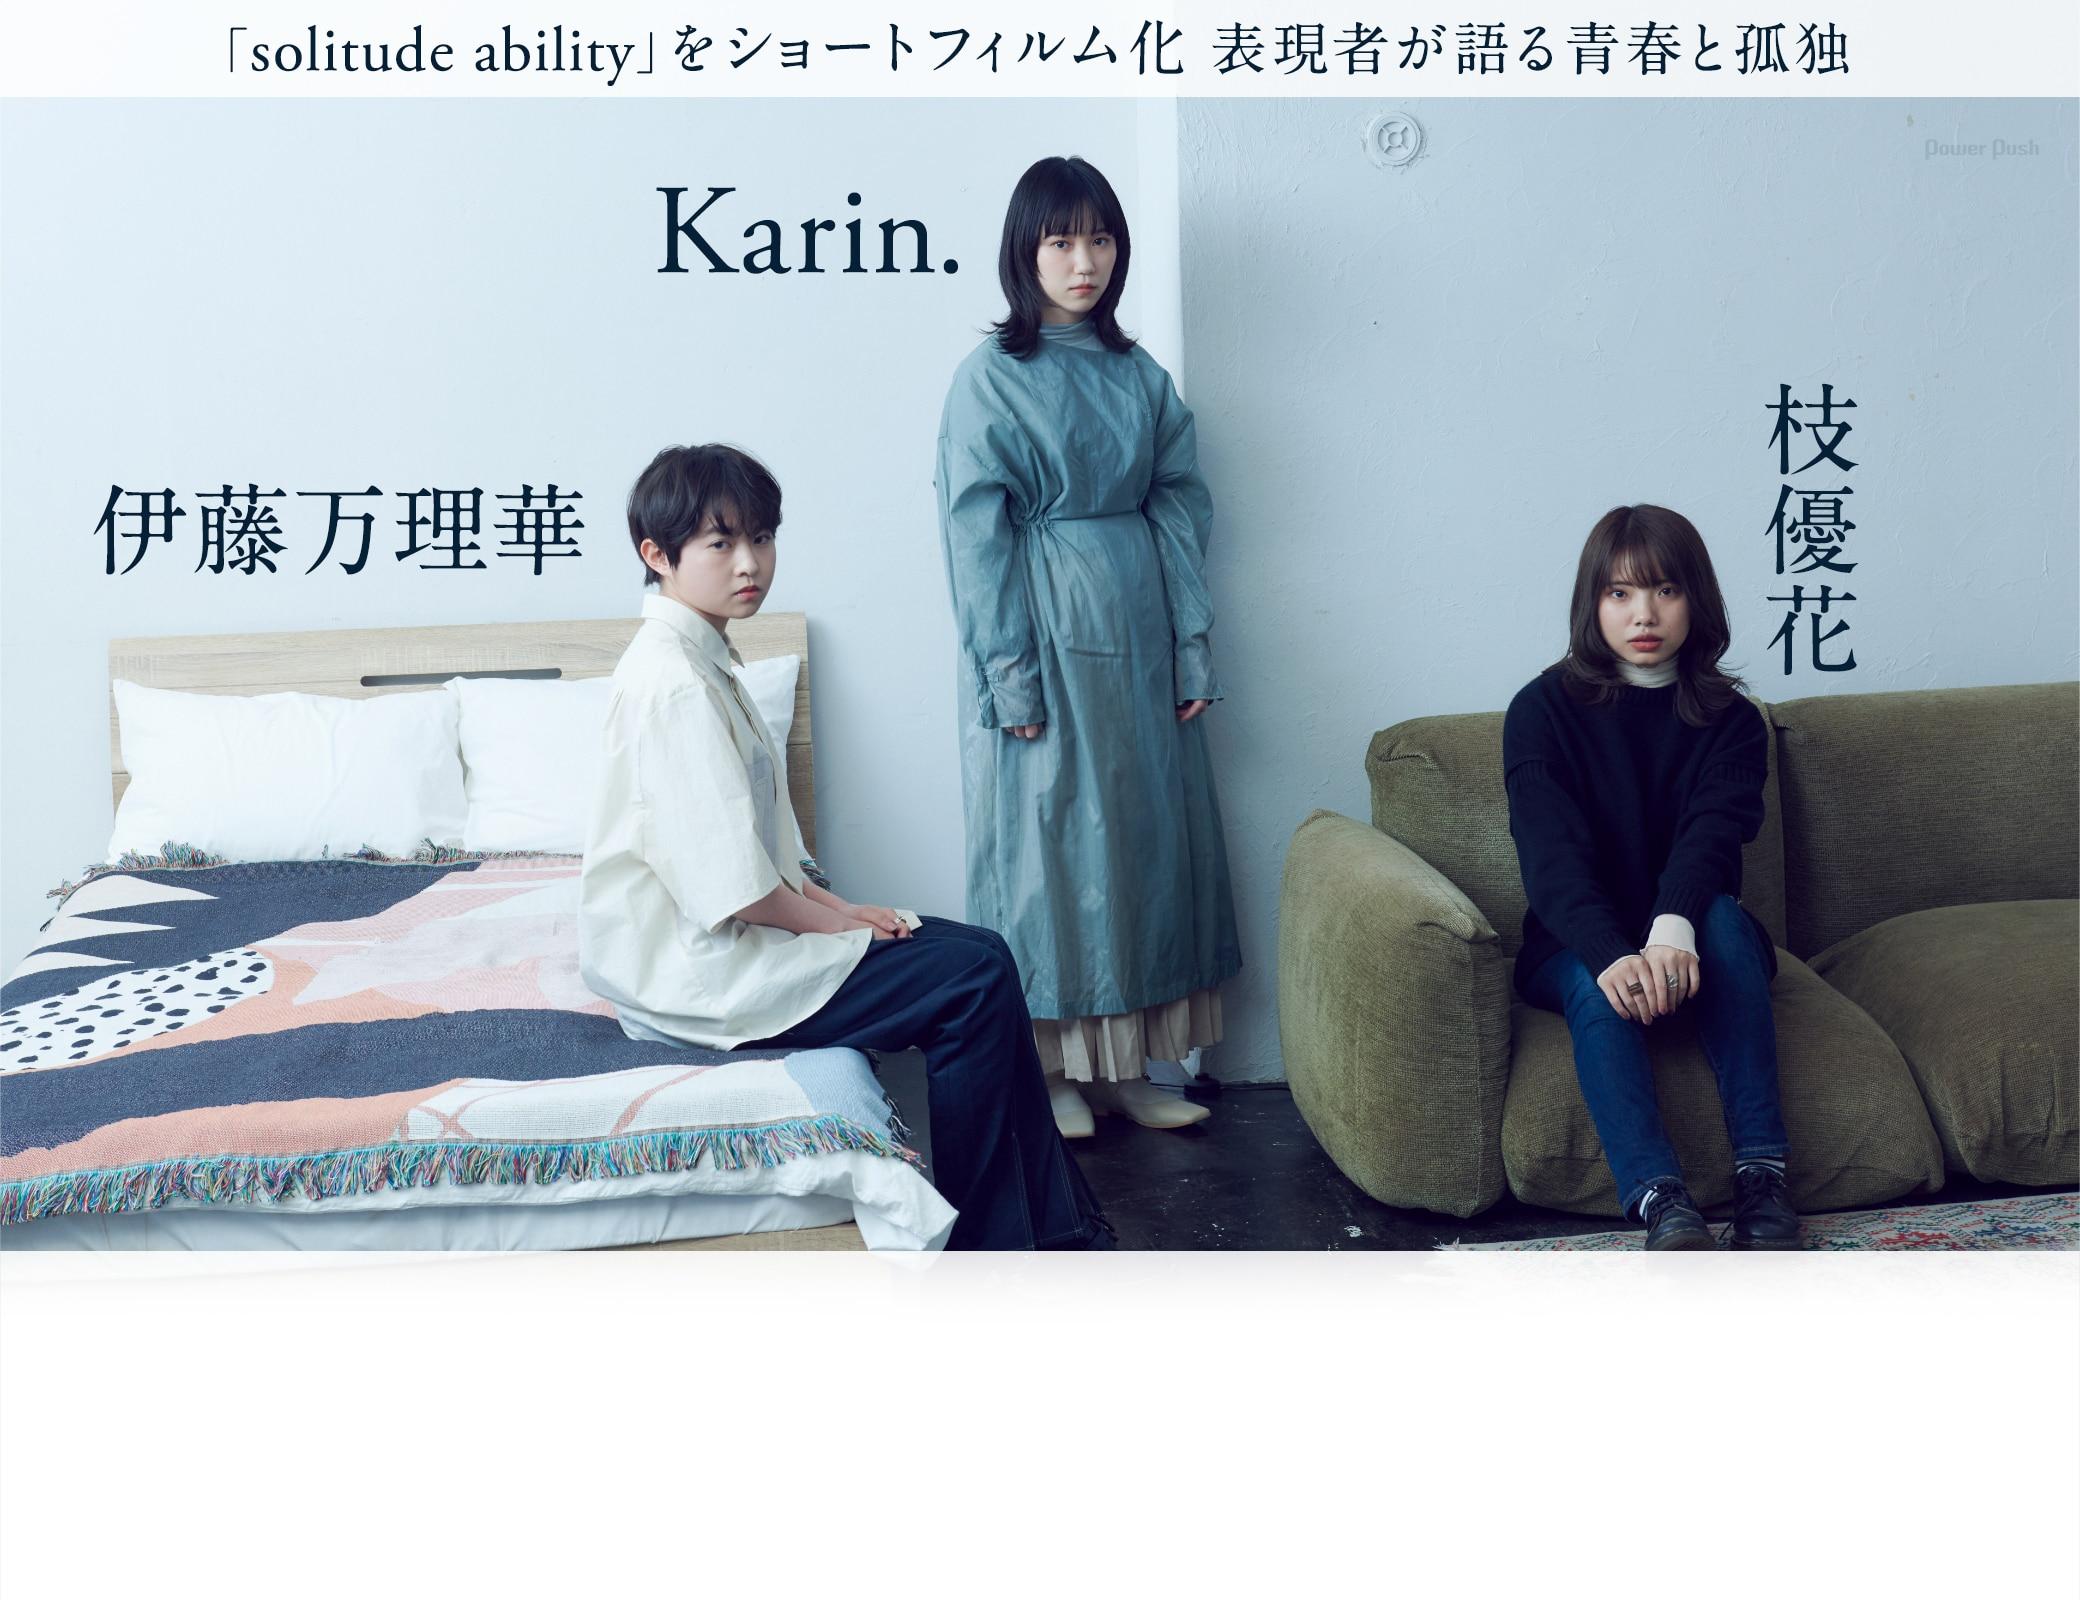 Karin.|「solitude ability」をショートフィルム化 表現者が語る青春と孤独